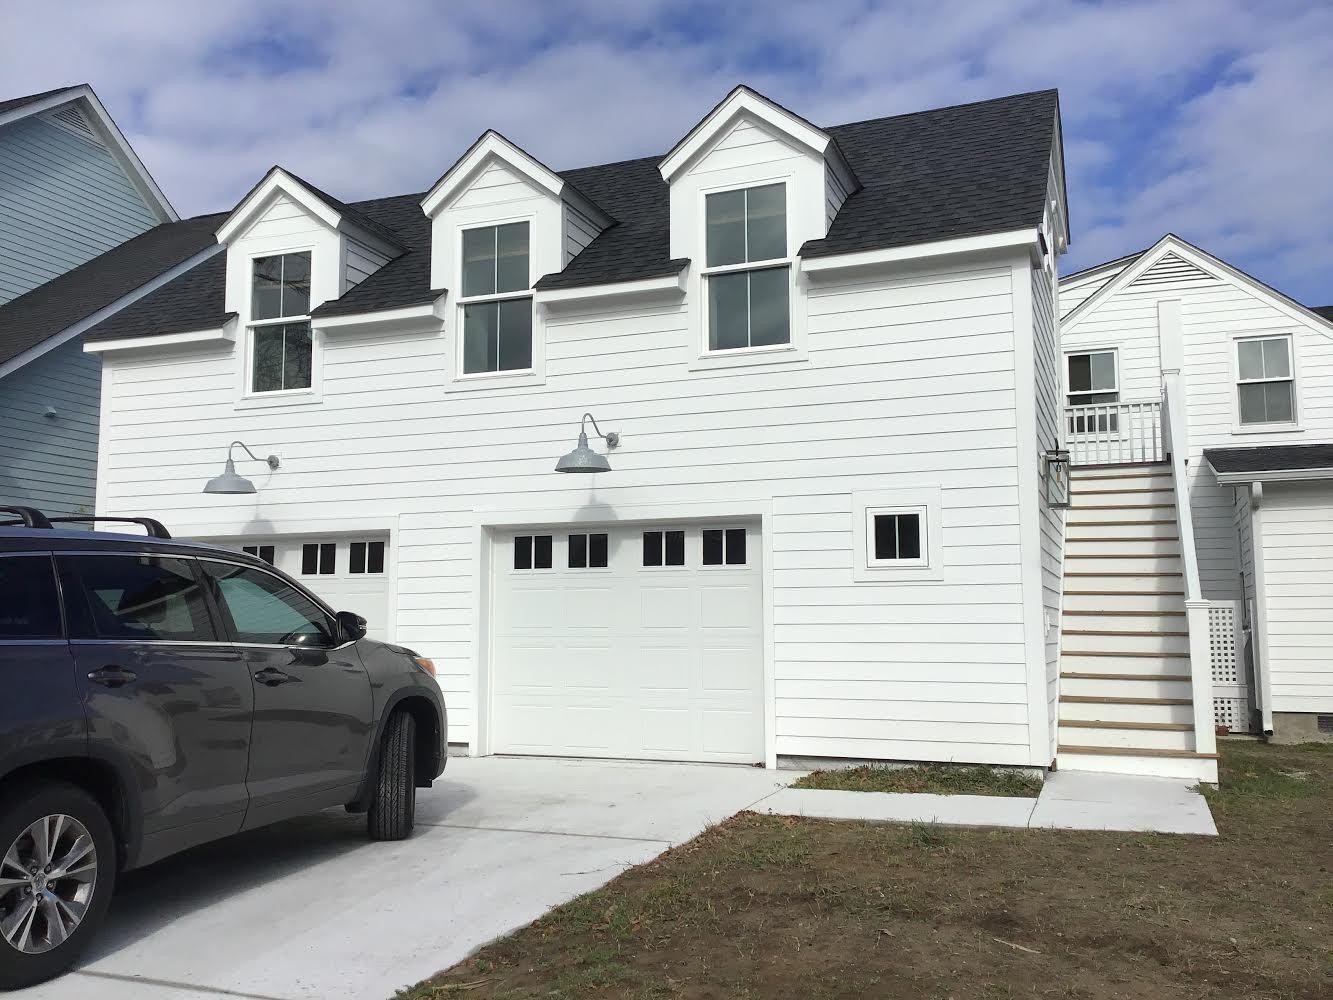 Old Mt Pleasant Homes For Sale - 542 Center, Mount Pleasant, SC - 5